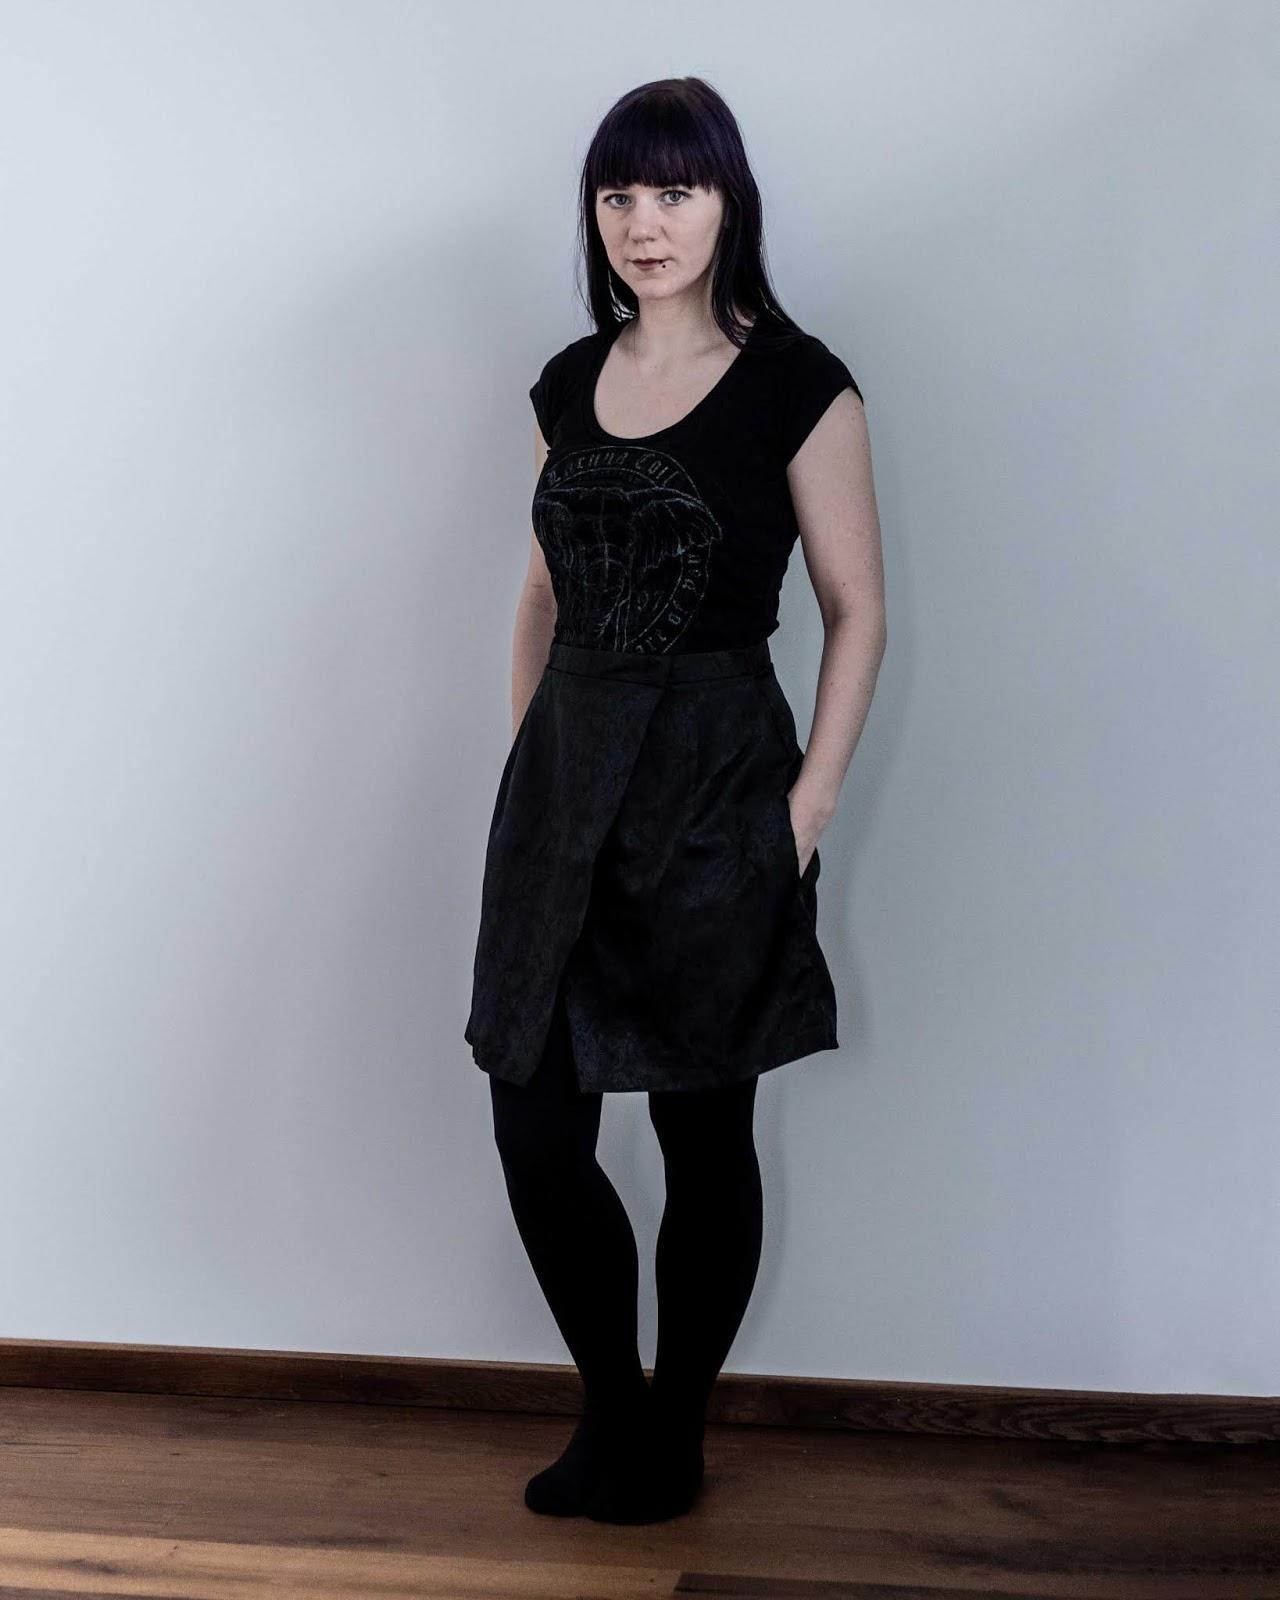 Nita wrap skirt sew diy sewing pattern made by minn's things self designed pockets